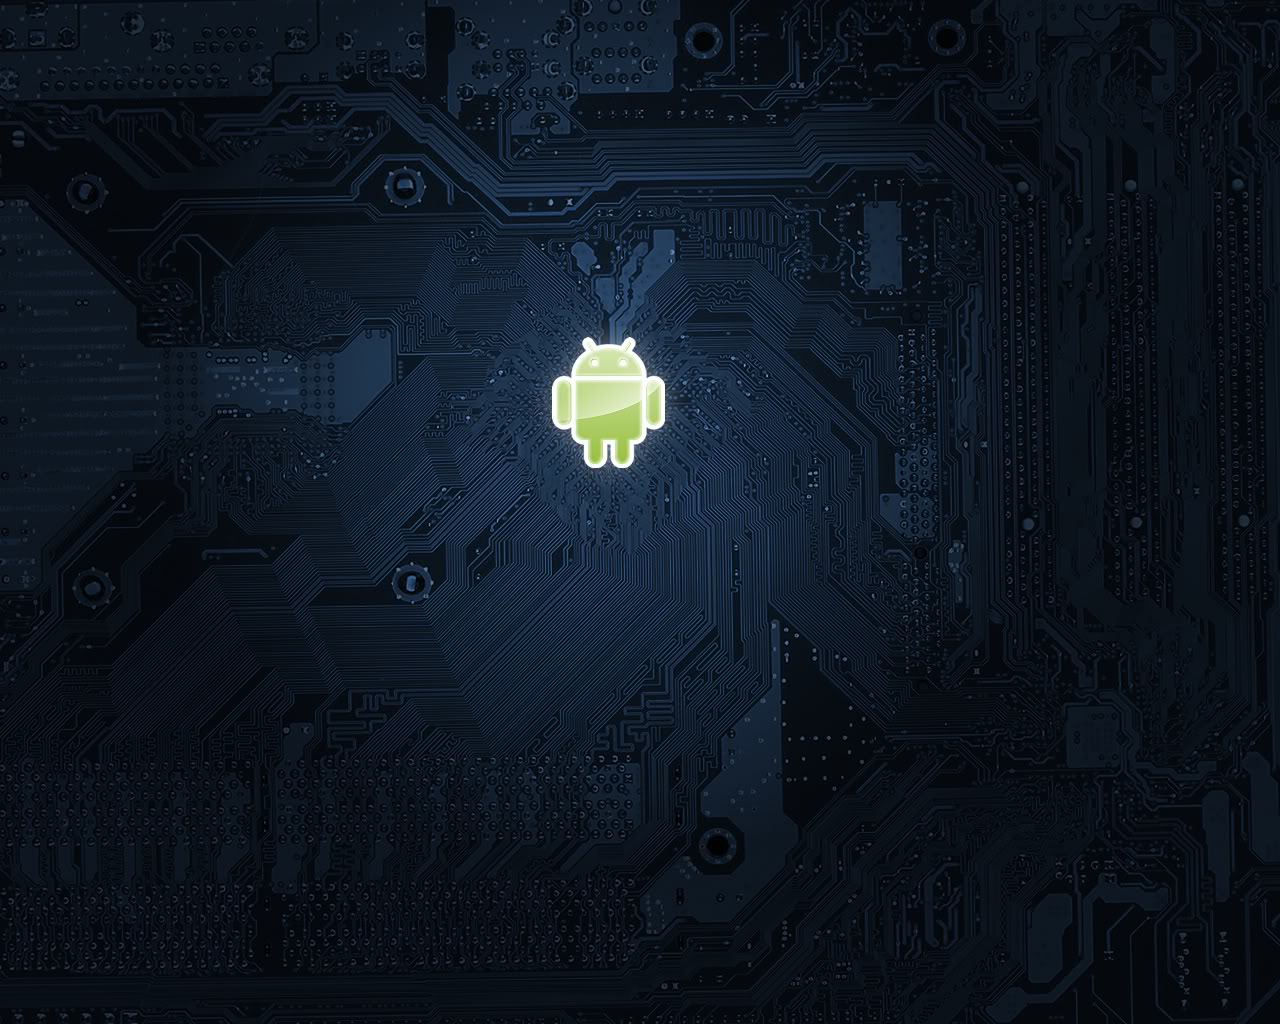 Android Wallpaper Mega Wallpapers HD 1280x1024